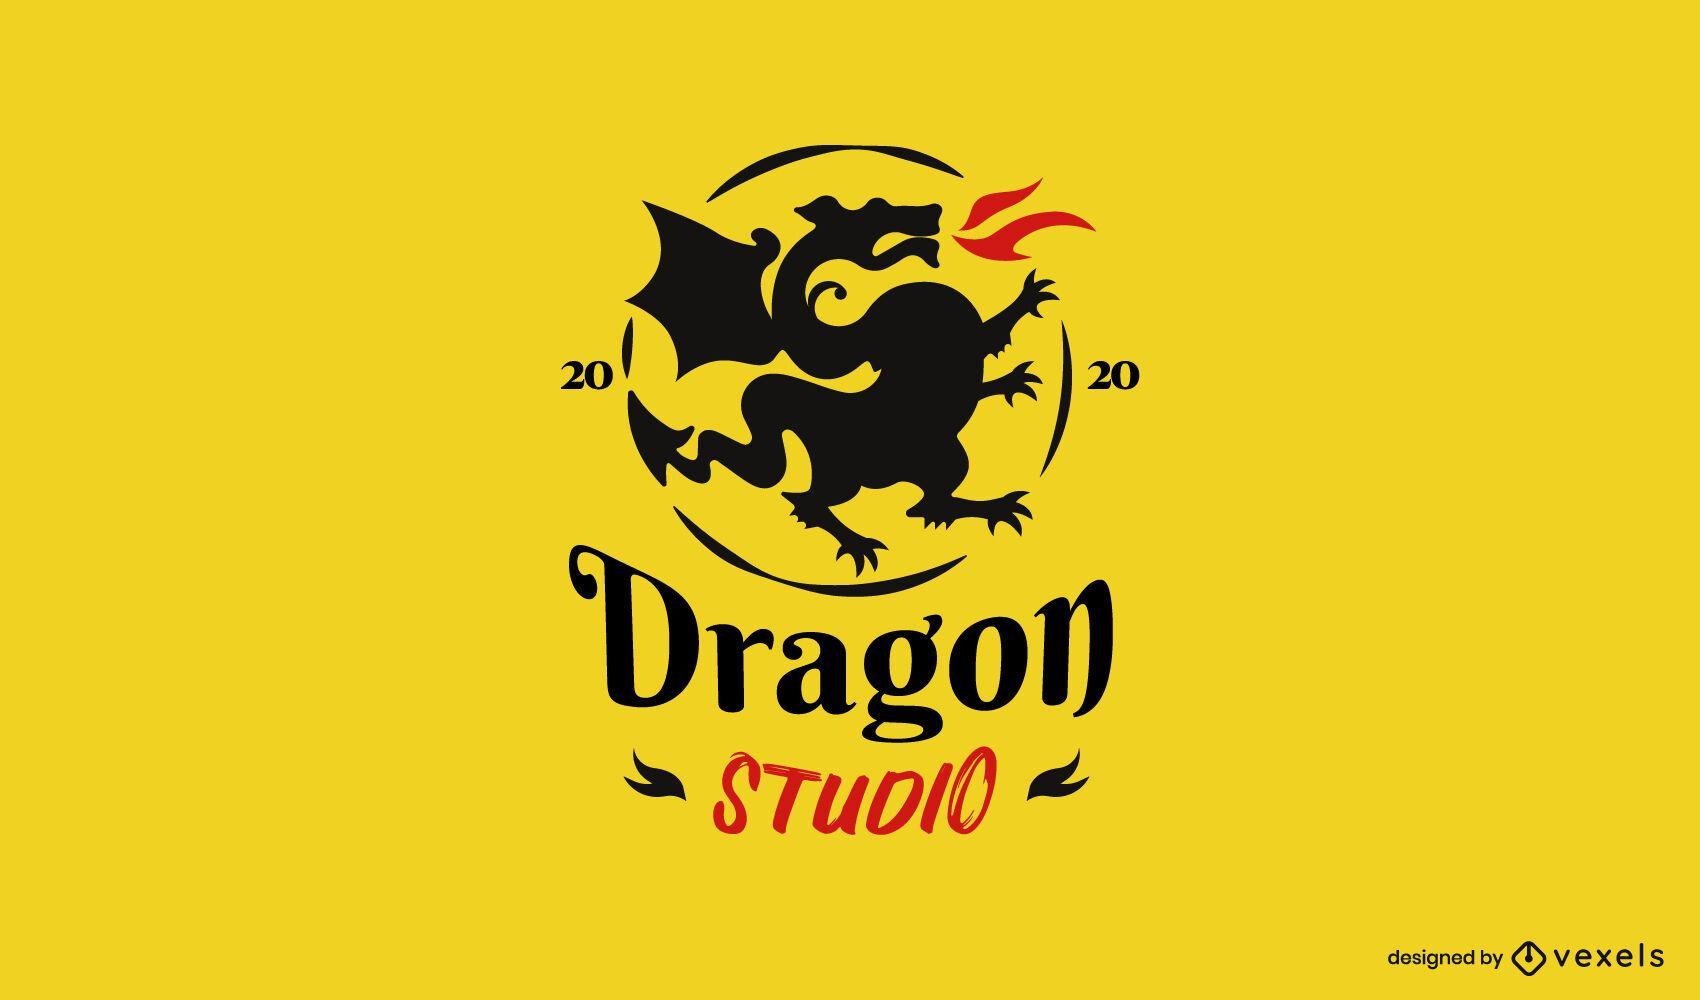 Modelo de logotipo do Dragon Studio